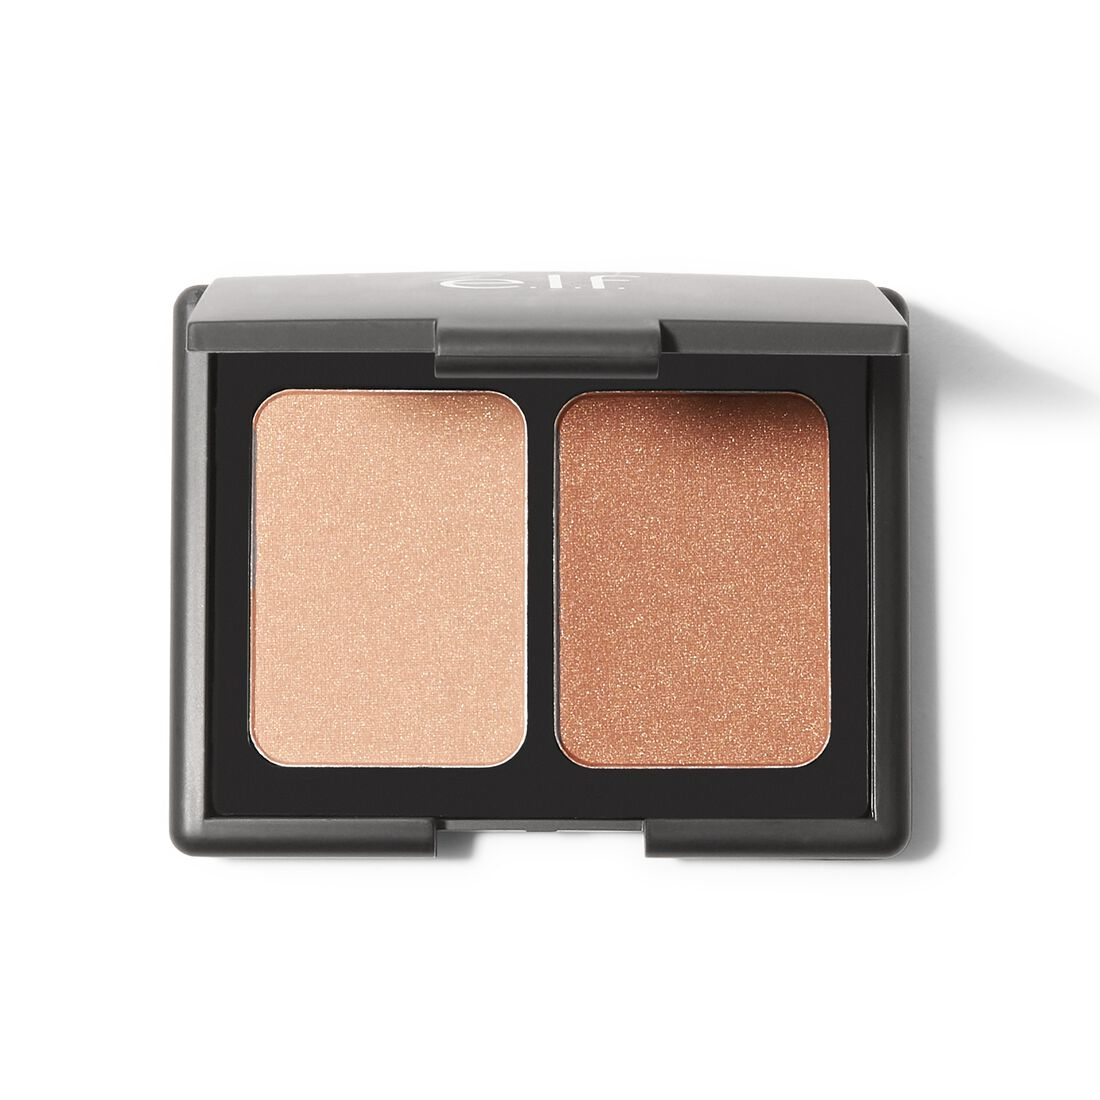 ELF Cosmetics - Contouring Blush & Bronzing Powder